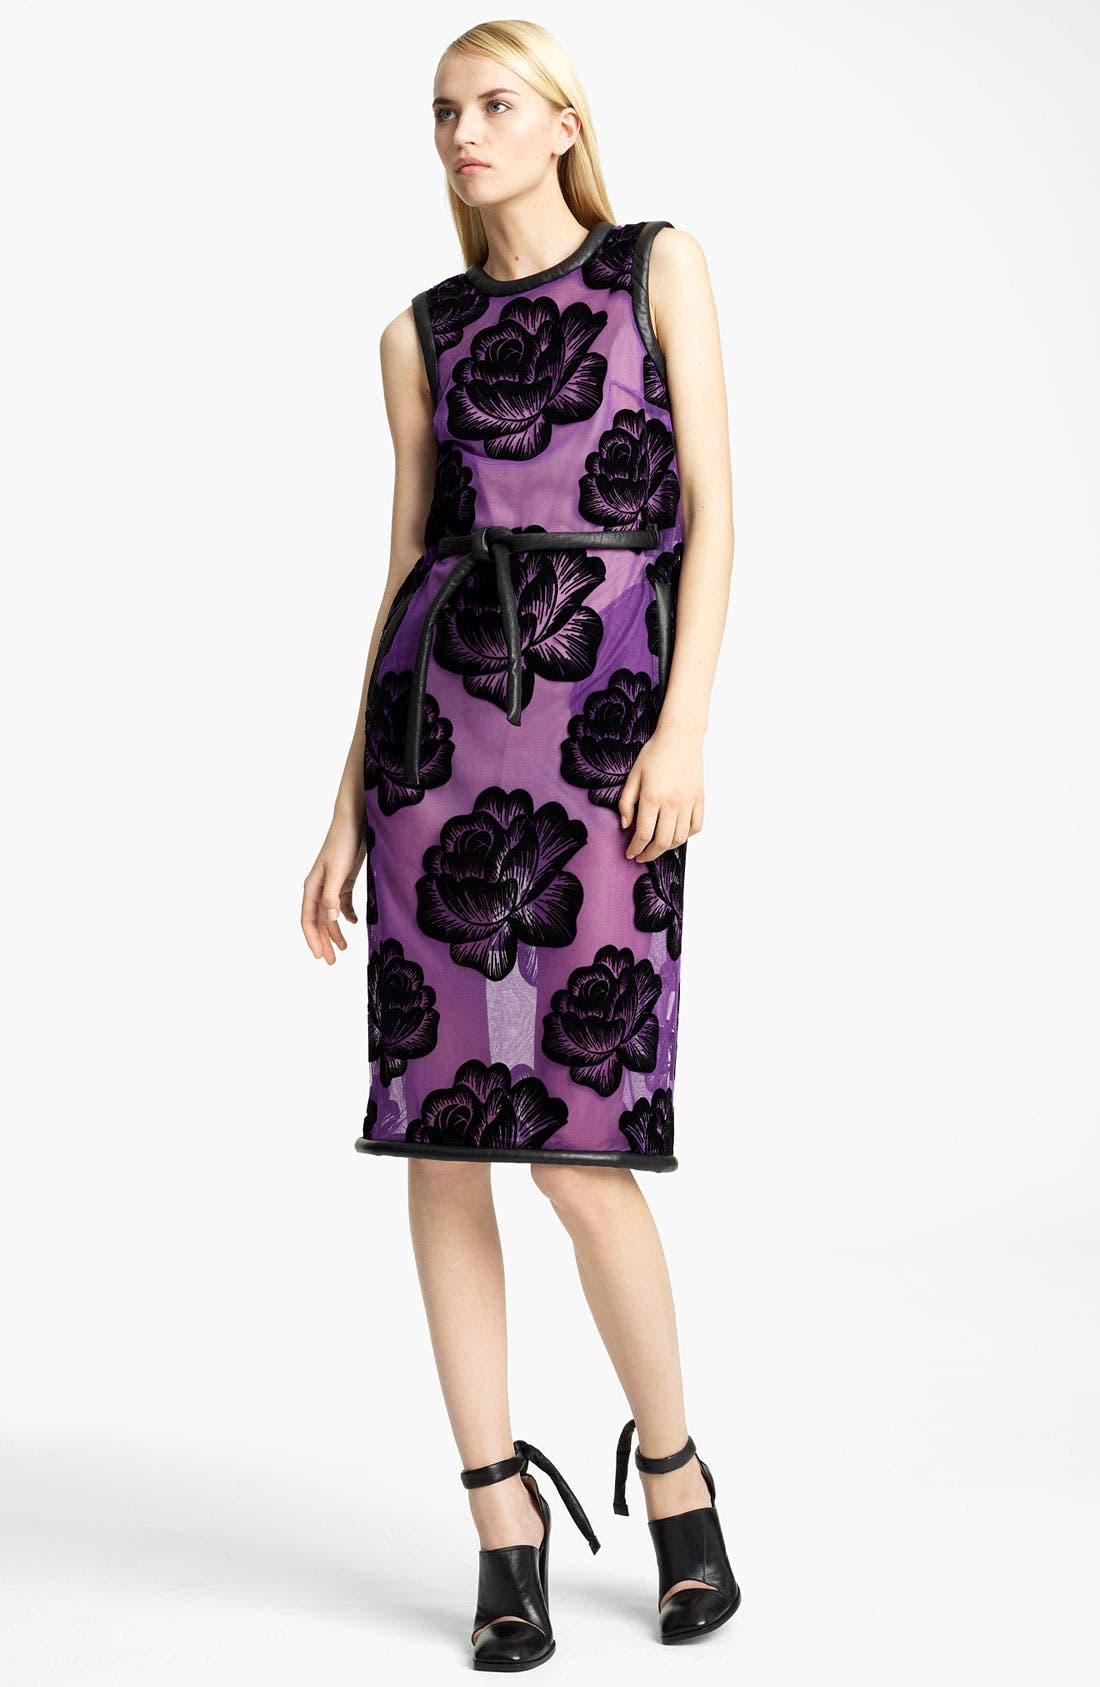 Alternate Image 1 Selected - Christopher Kane Tie Belt Rose Tulle Dress